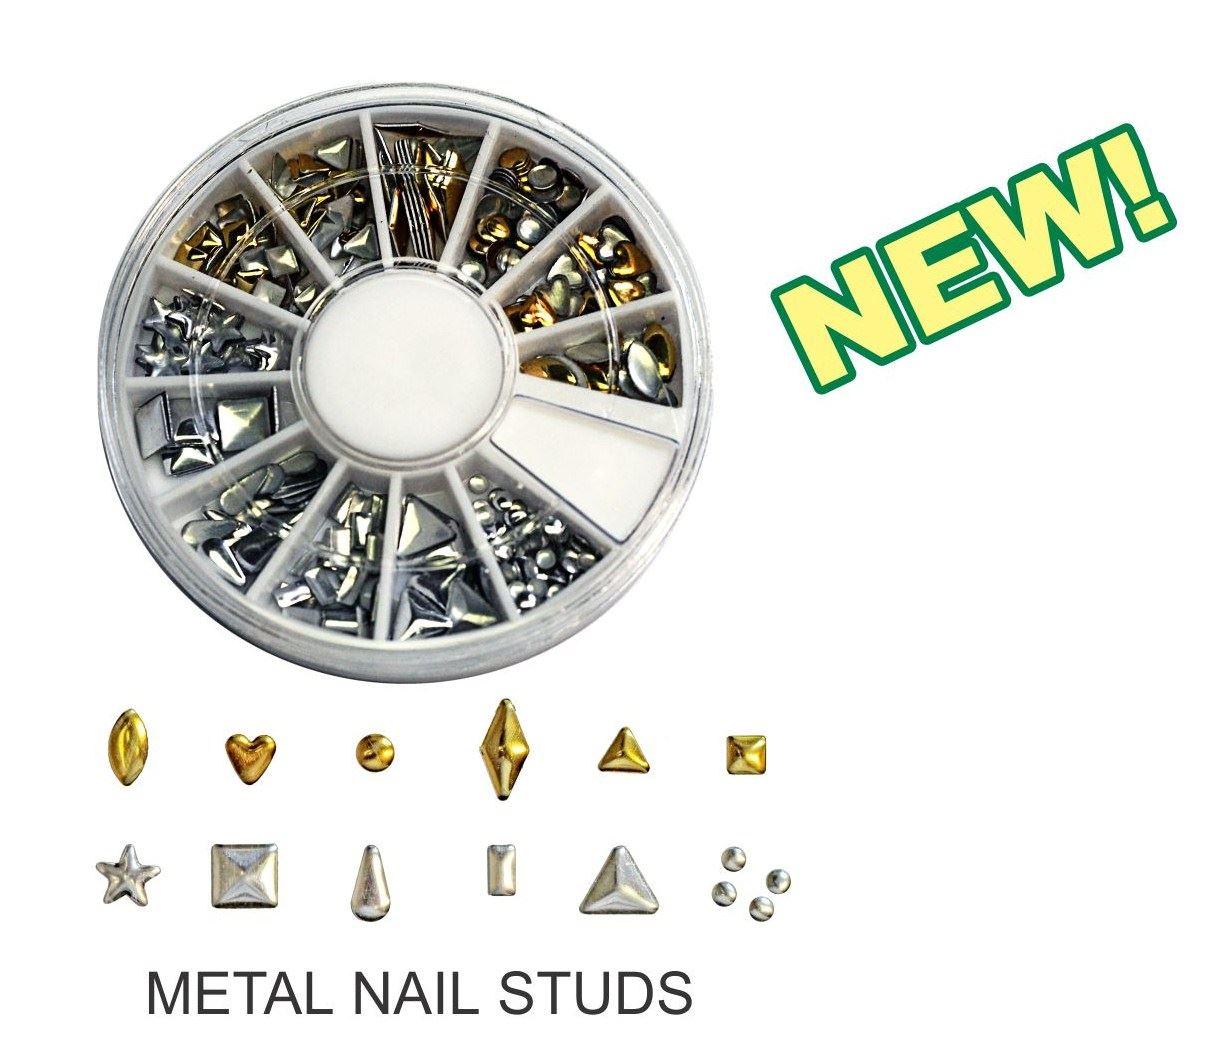 METAL NAIL STUDS - Nail Accessories - Lamour Nail Products Inc